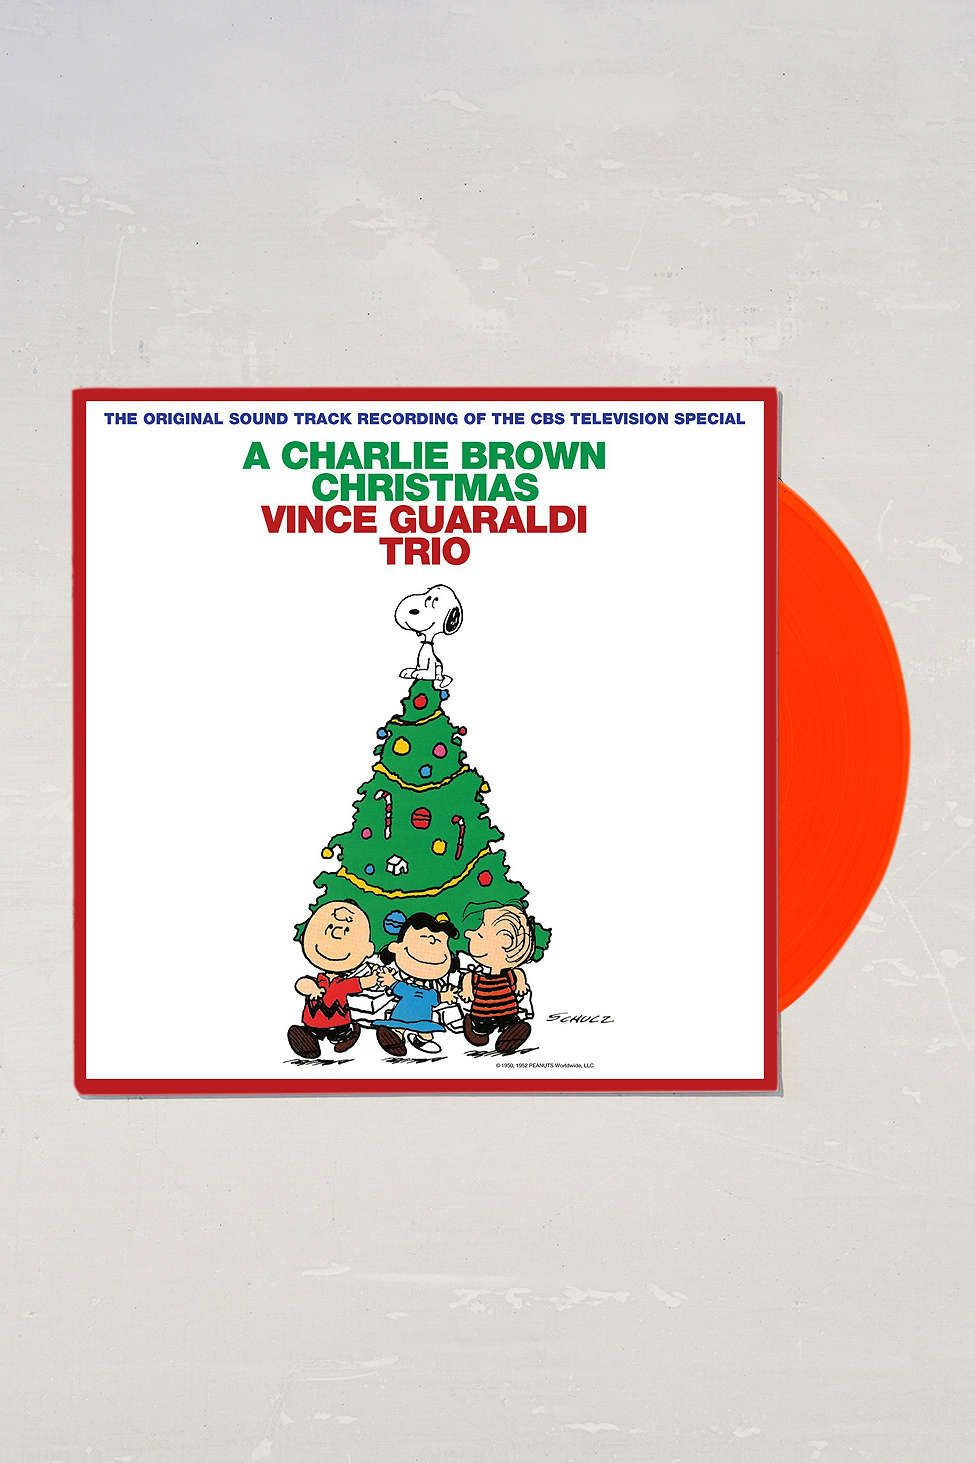 Vince Guaraldi Trio - A Charlie Brown Christmas LP | Vince guaraldi ...